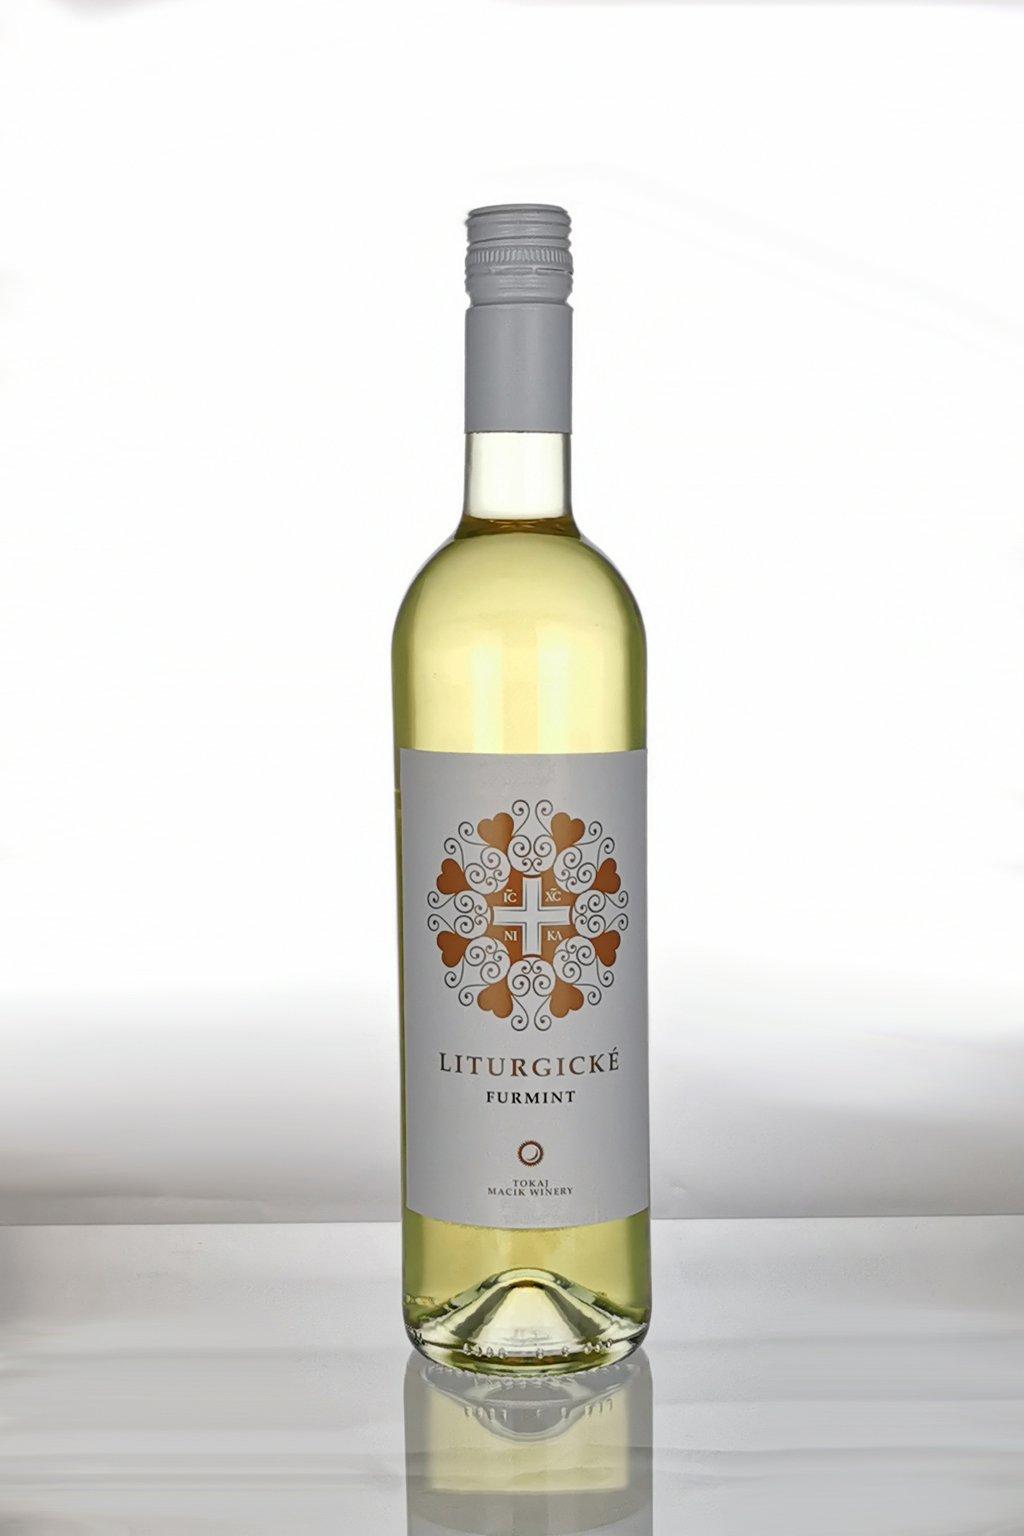 Liturgicke vino Tokajmacik